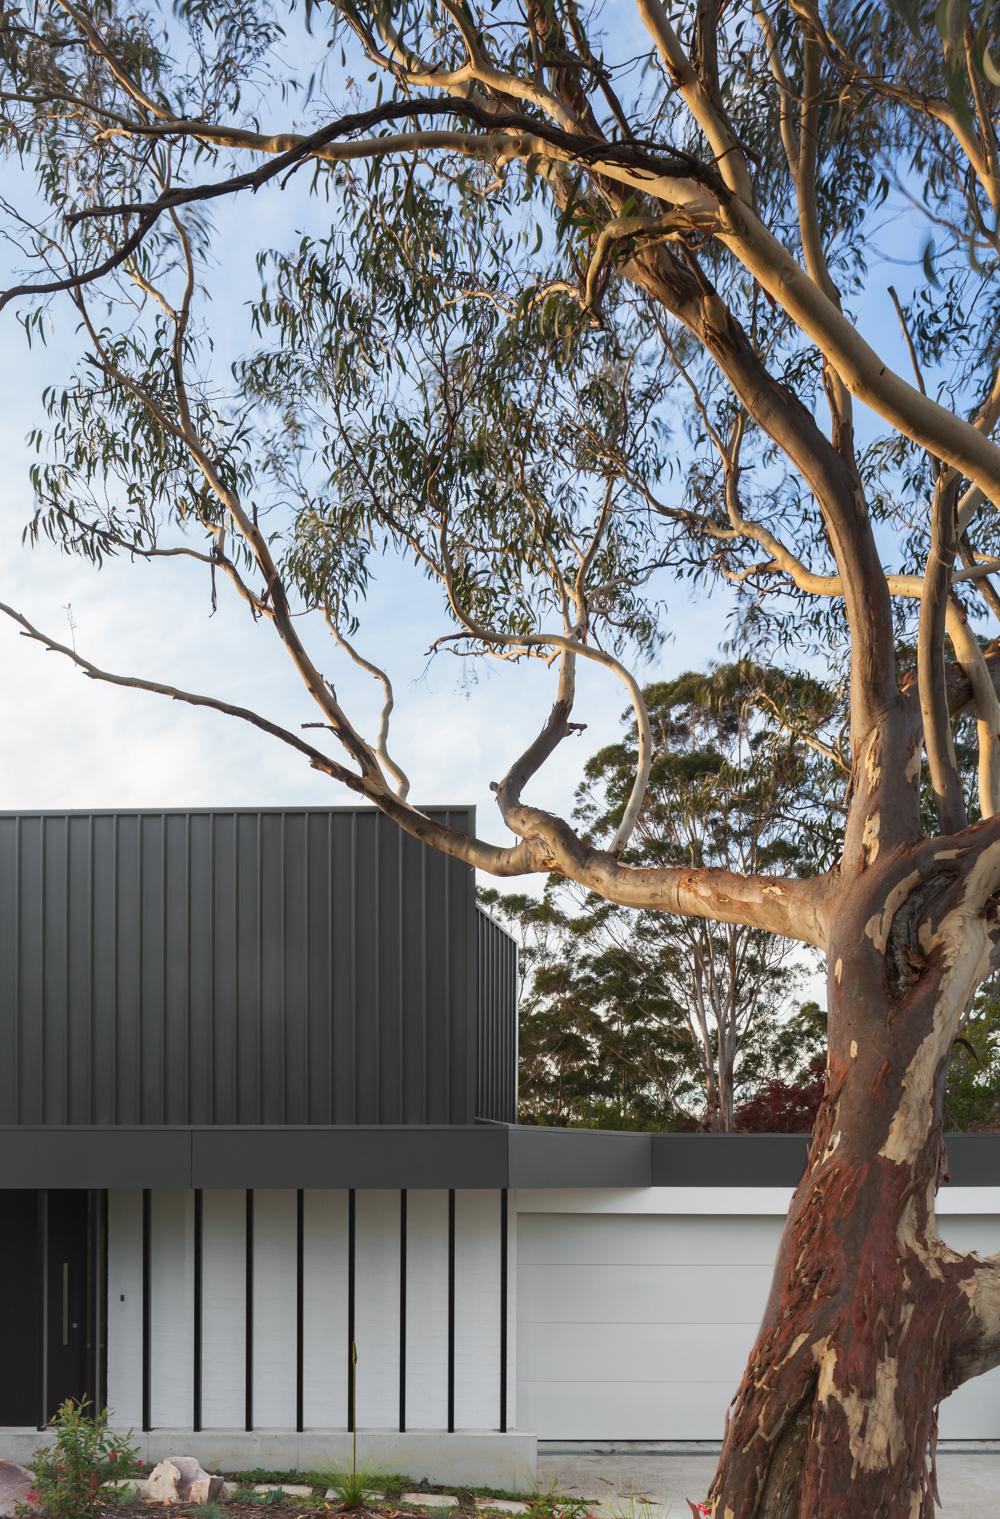 turramurra-house=noxon-giffen-architects-the-design-emotive--3.jpg